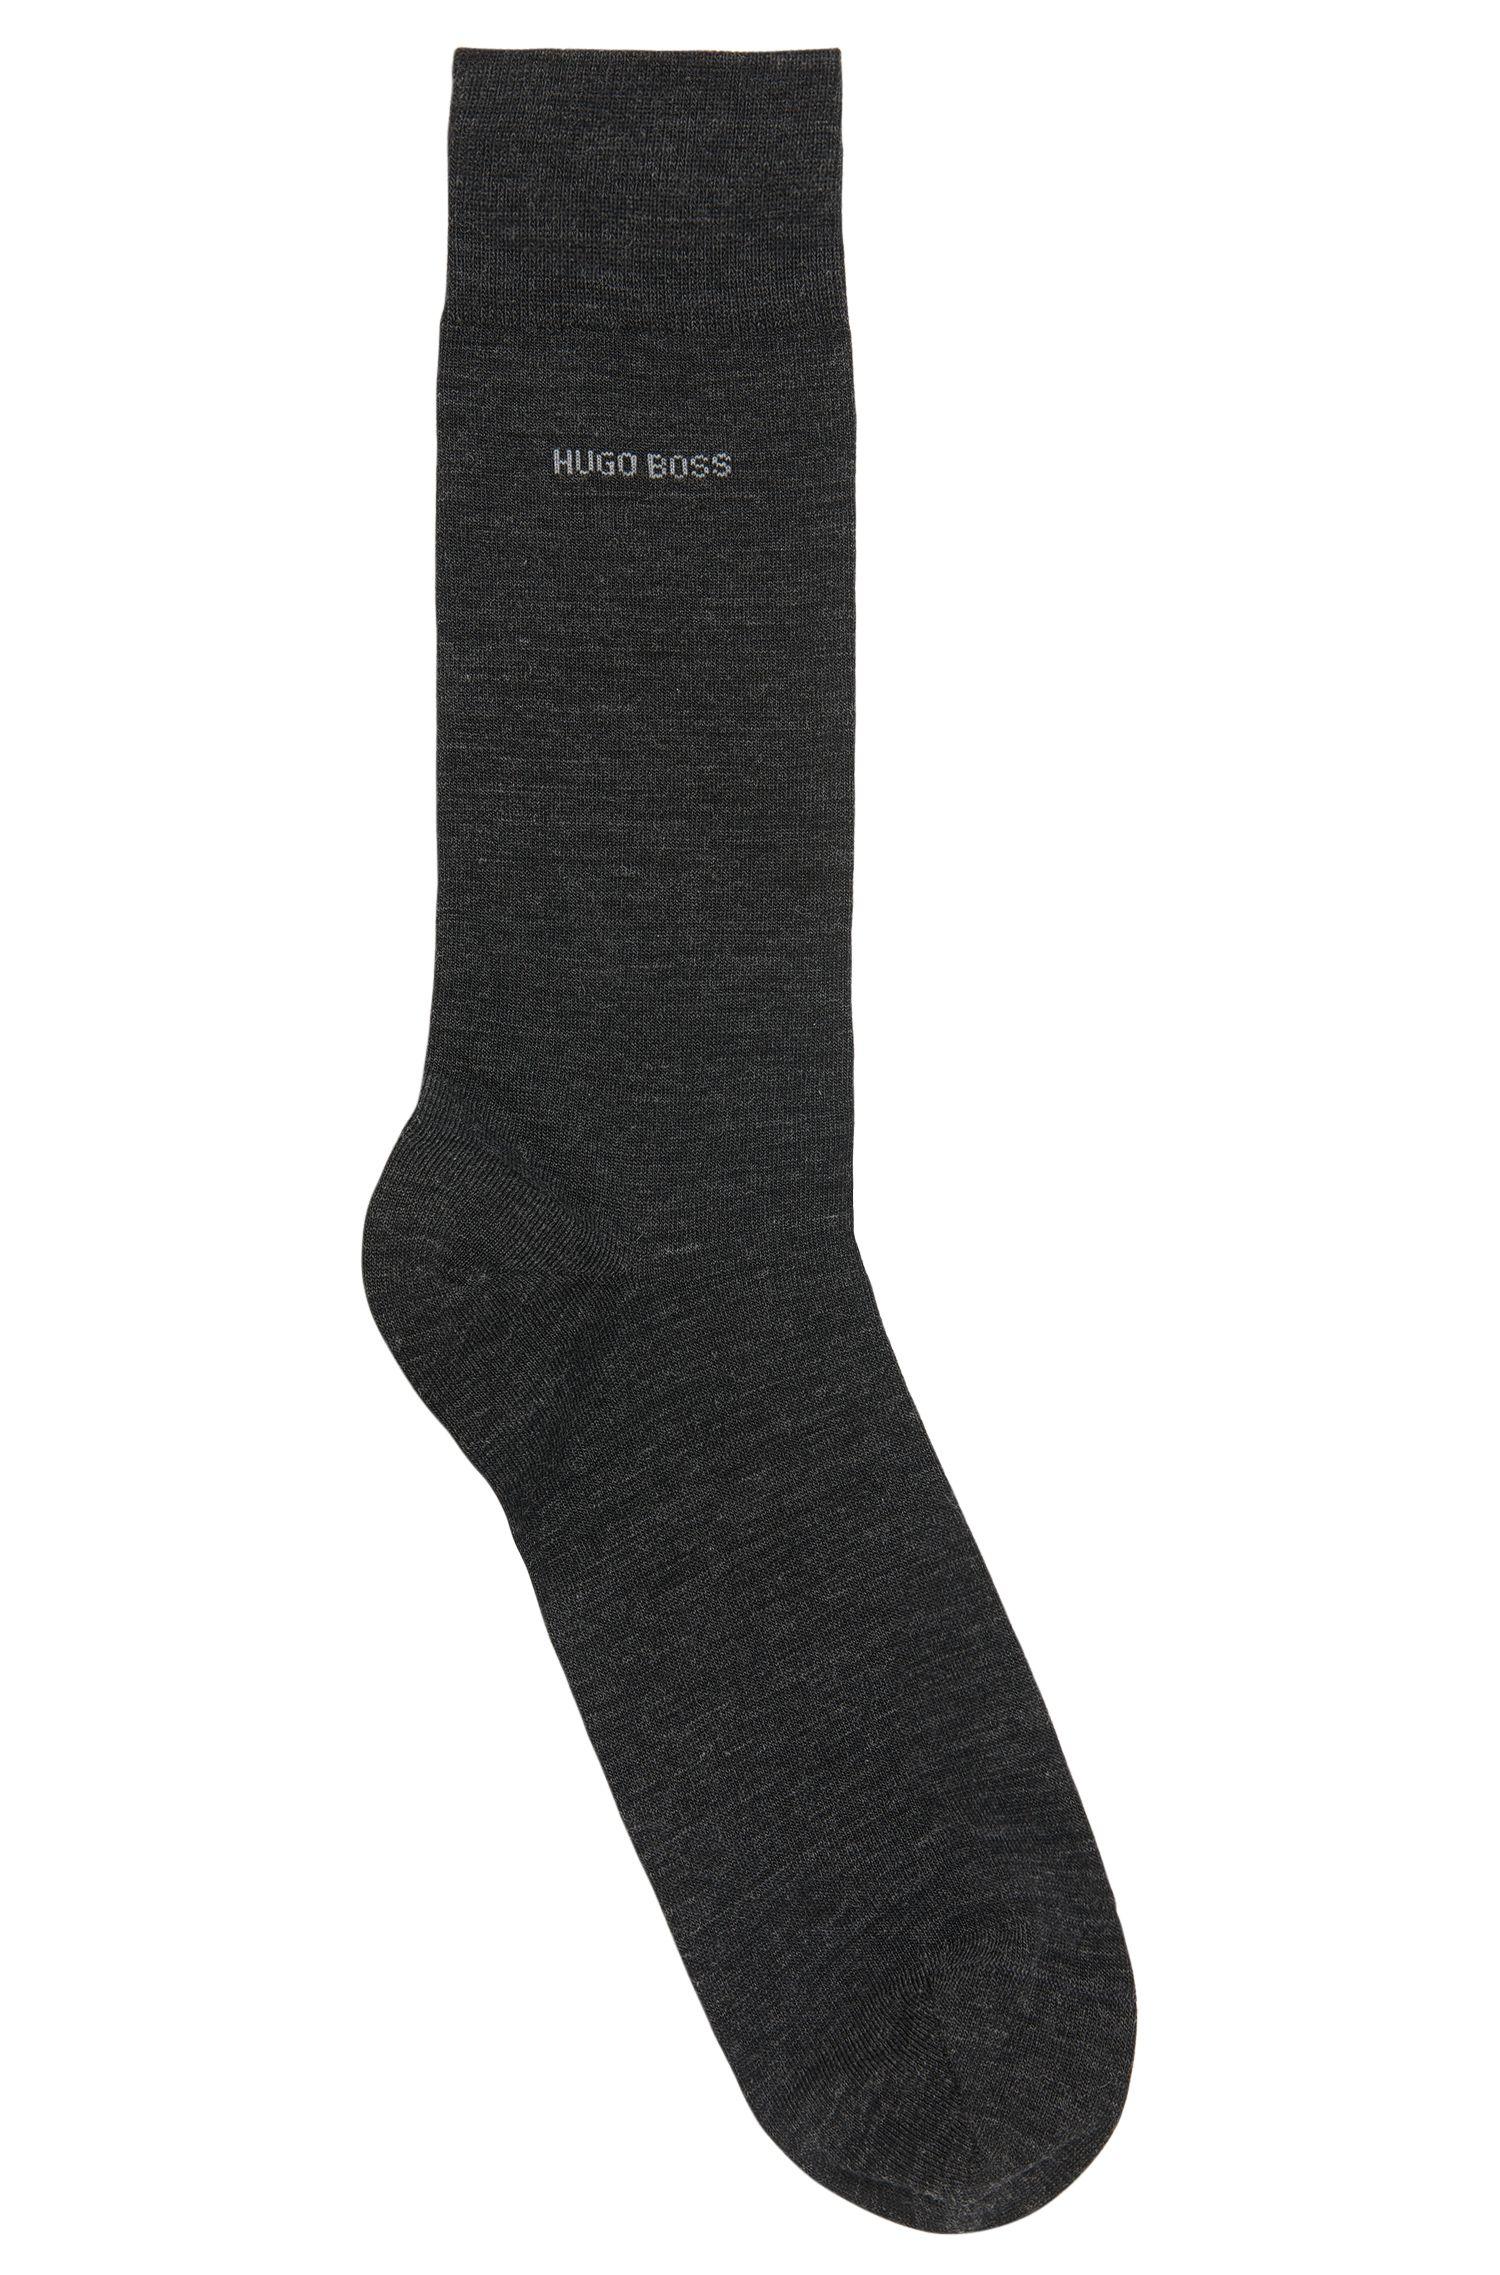 Merino wool and cotton blend socks